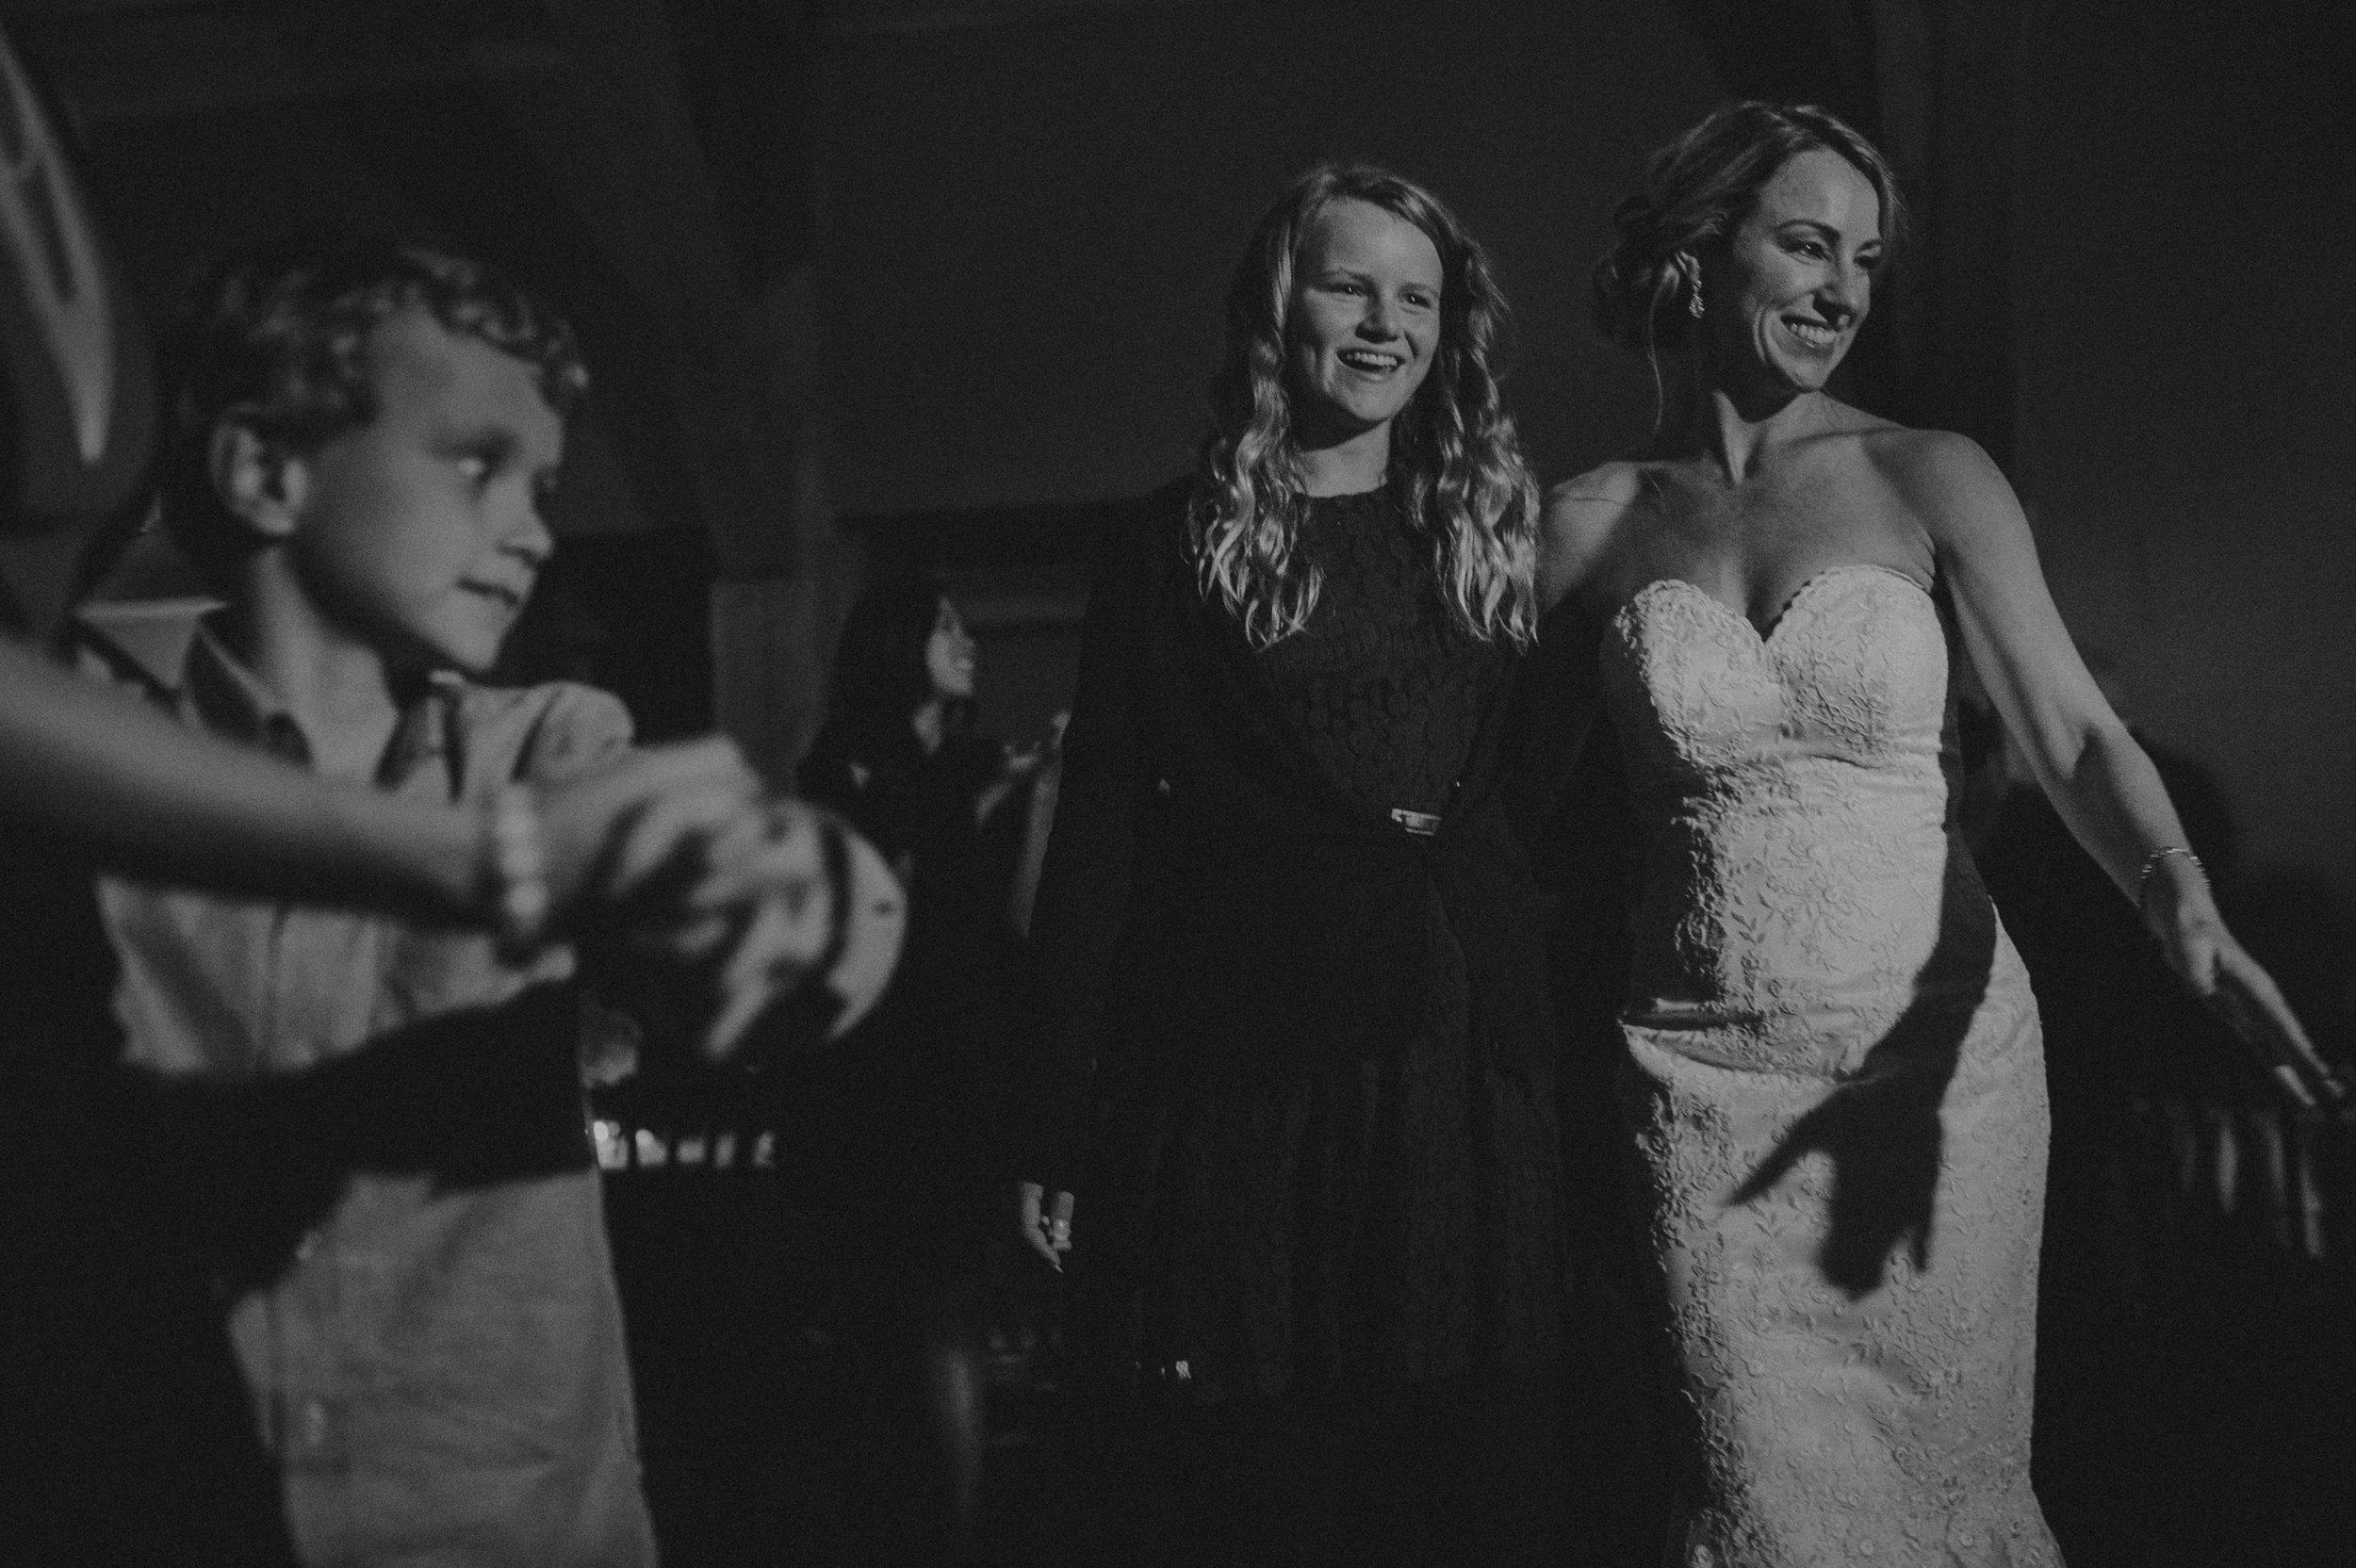 Banff-Wedding-Photographer-59.jpg